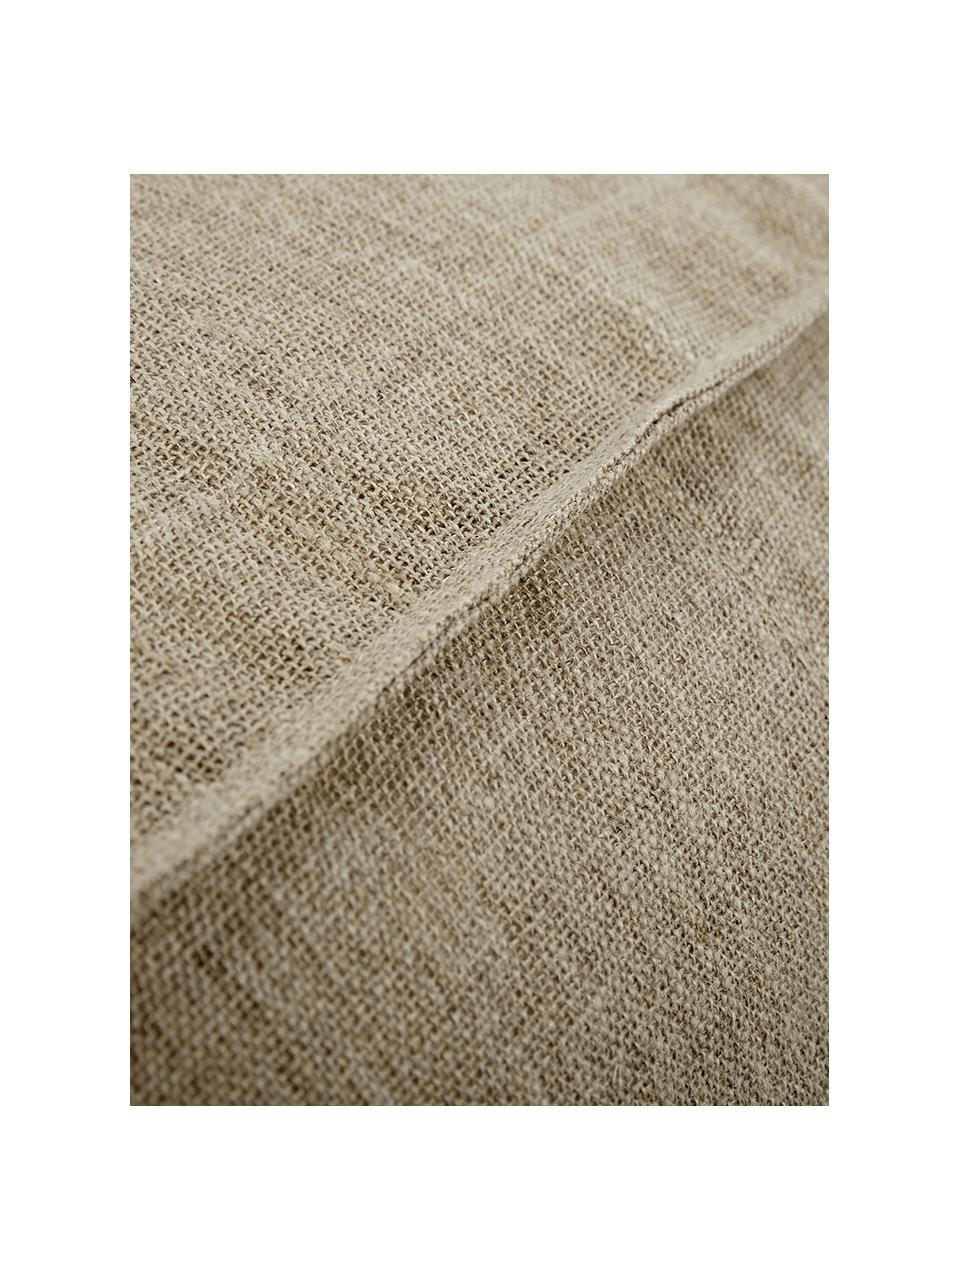 Cojín de suelo artesanal de lino Saffron, Funda: 100%lino, Interior: 100%algodón, Gris pardo, An 50 x Al 25 cm